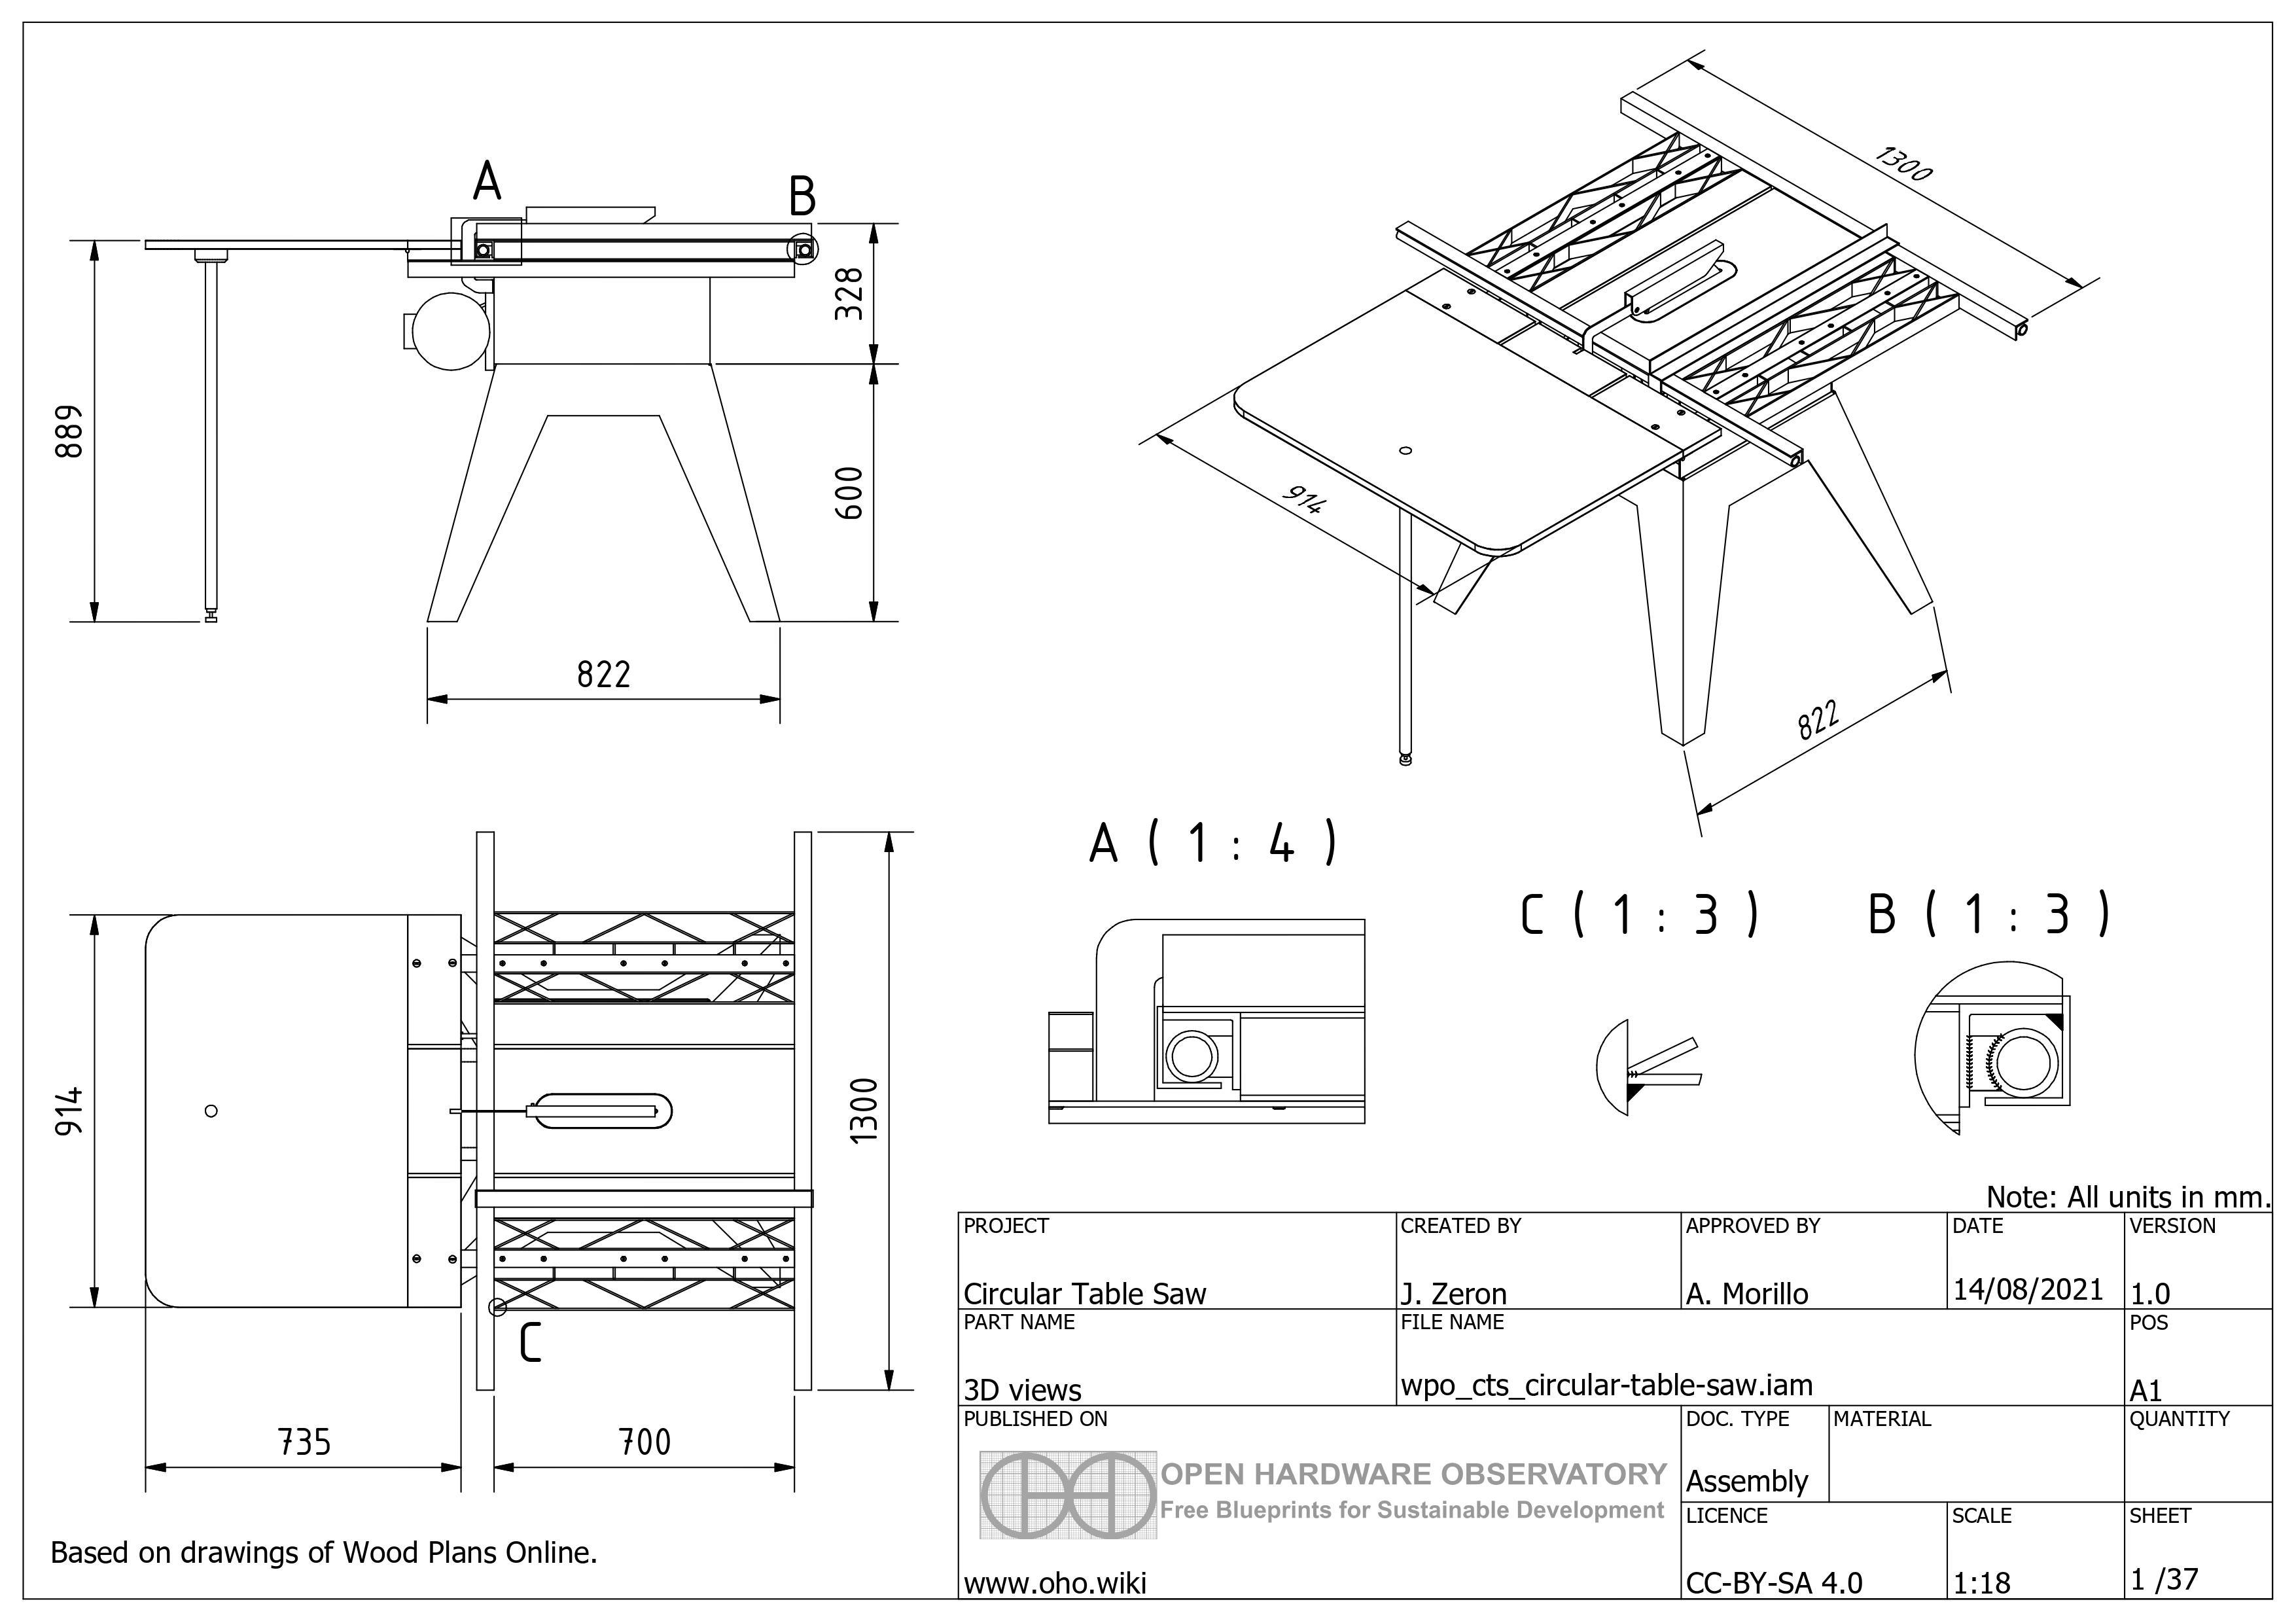 Wpo cts circular-table-saw 0001.jpg